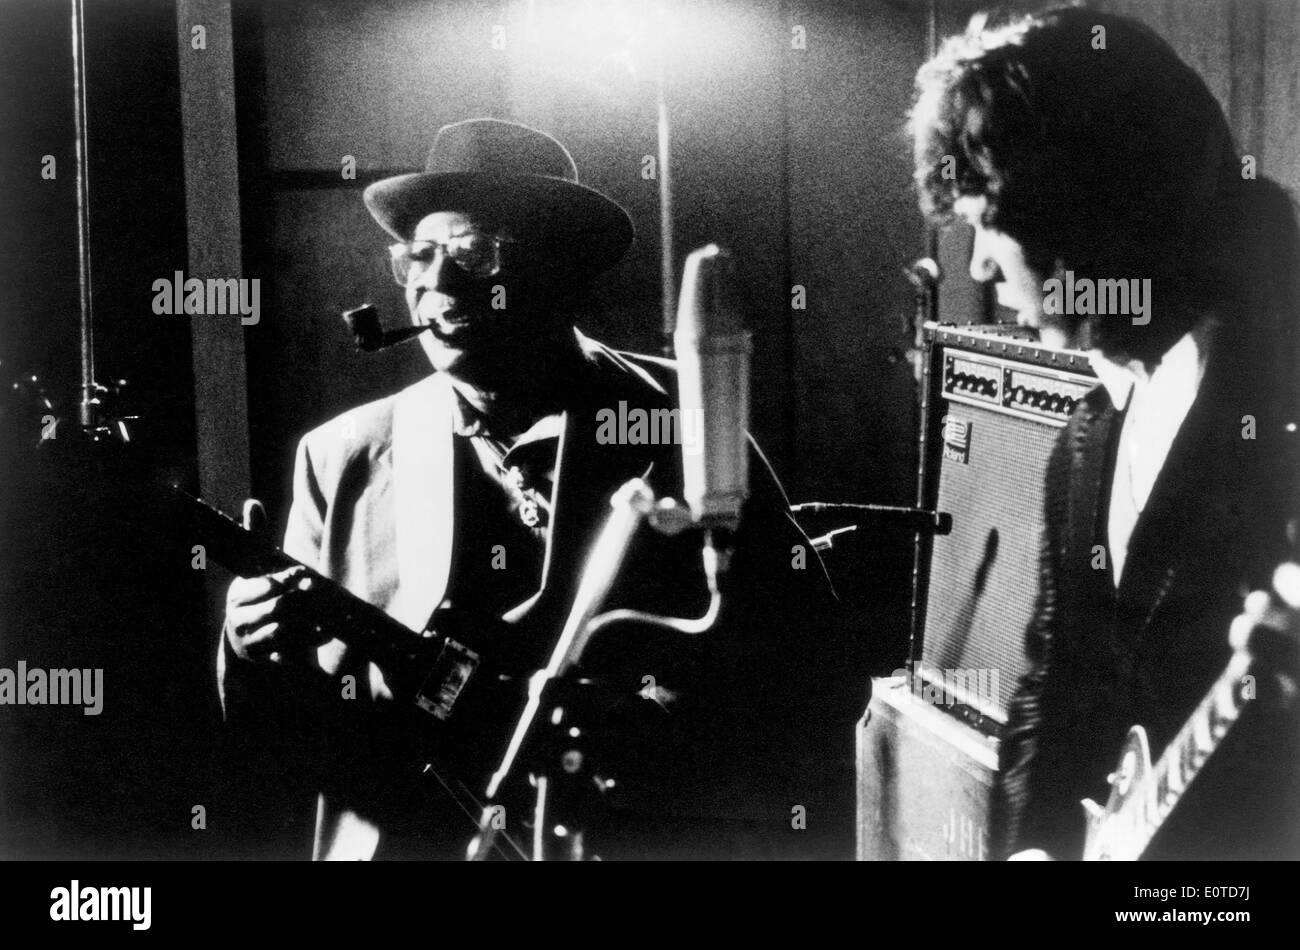 Musicians Albert King & Gary Moore during Performance, circa 1980's - Stock Image